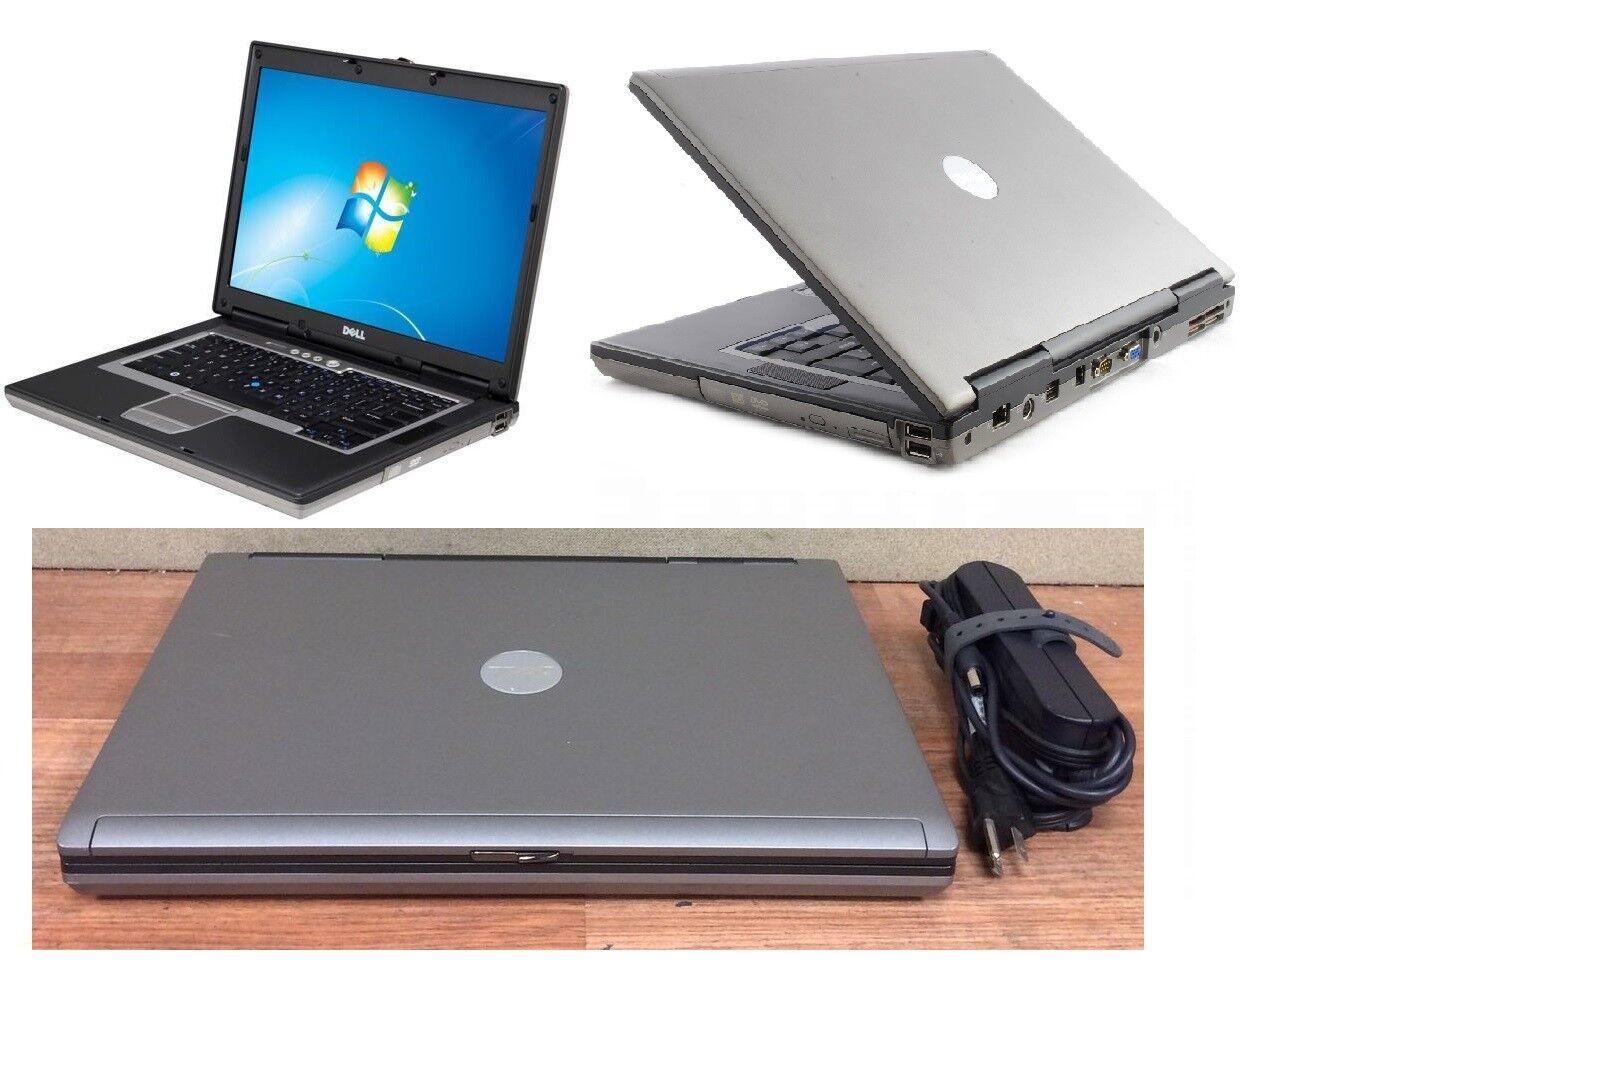 "Dell Latitude D830 LAPTOP 15.4"" Screen Laptop Notebook 160gb SSD Win 7 PRO"